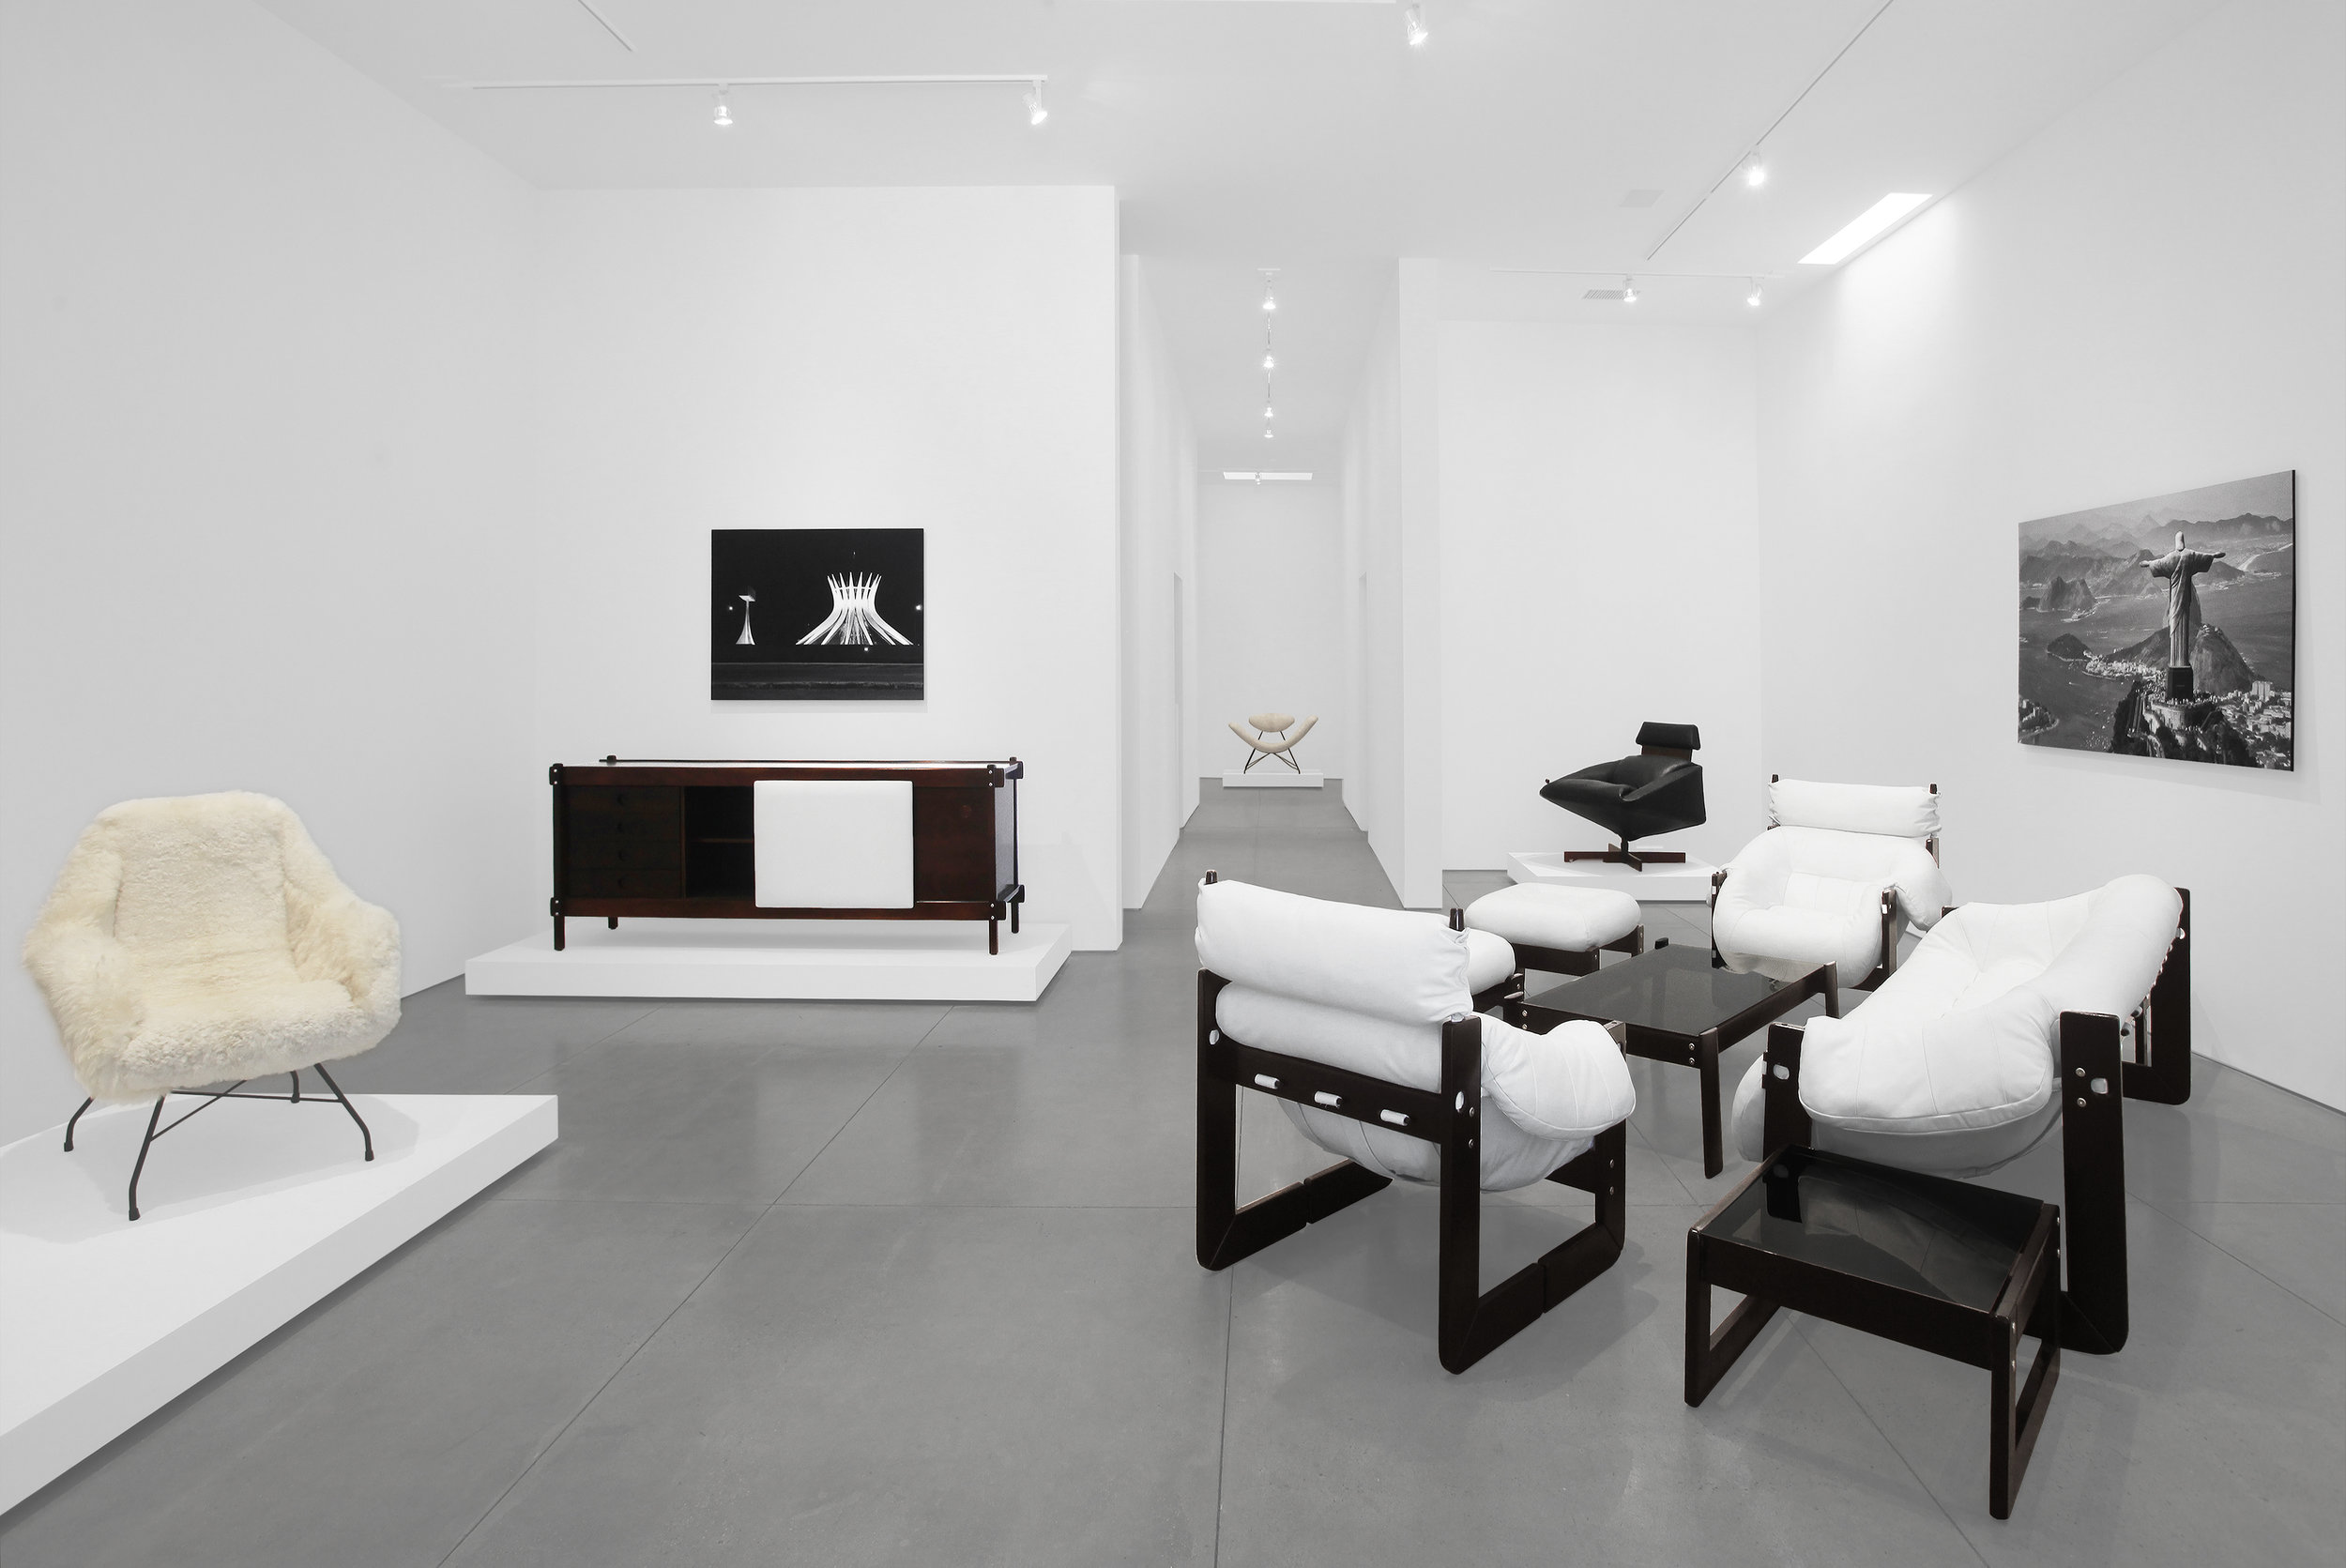 Design Brasileiro, Curated by Ulysses de Santi, Peter Blake Gallery, 2018, Installation View_14.jpg